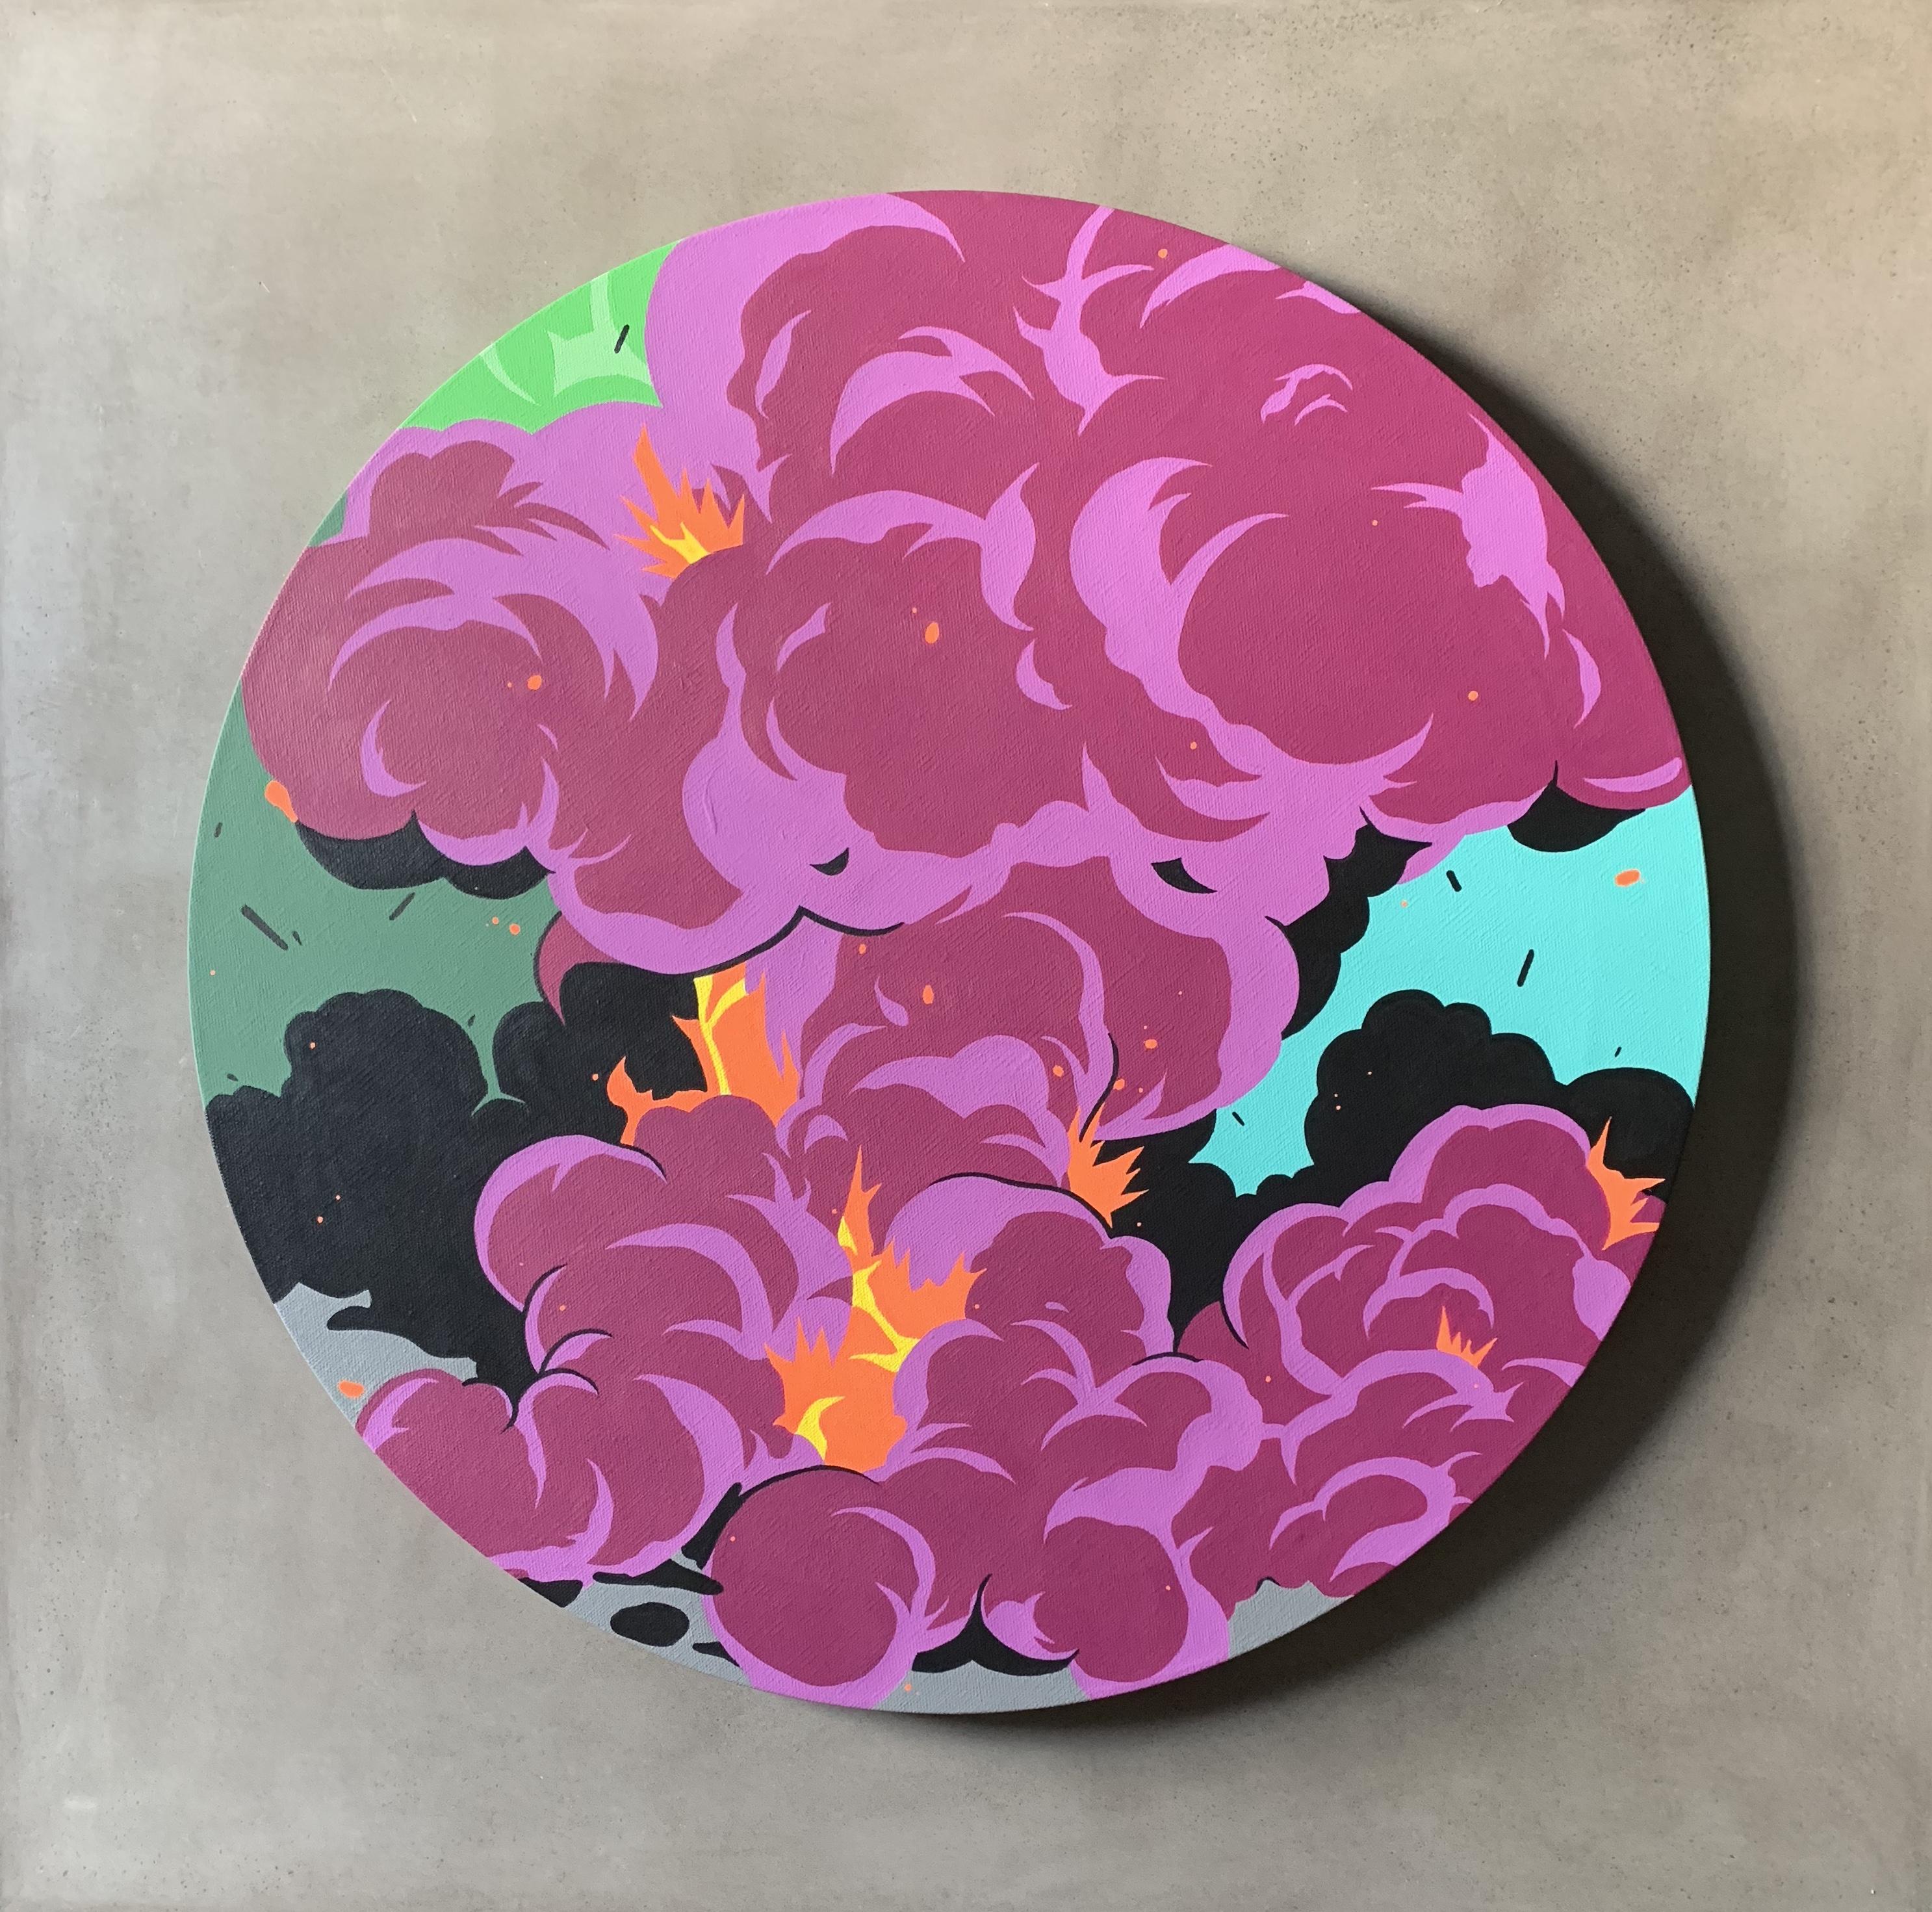 Nover art explosion abstract graffiti new york